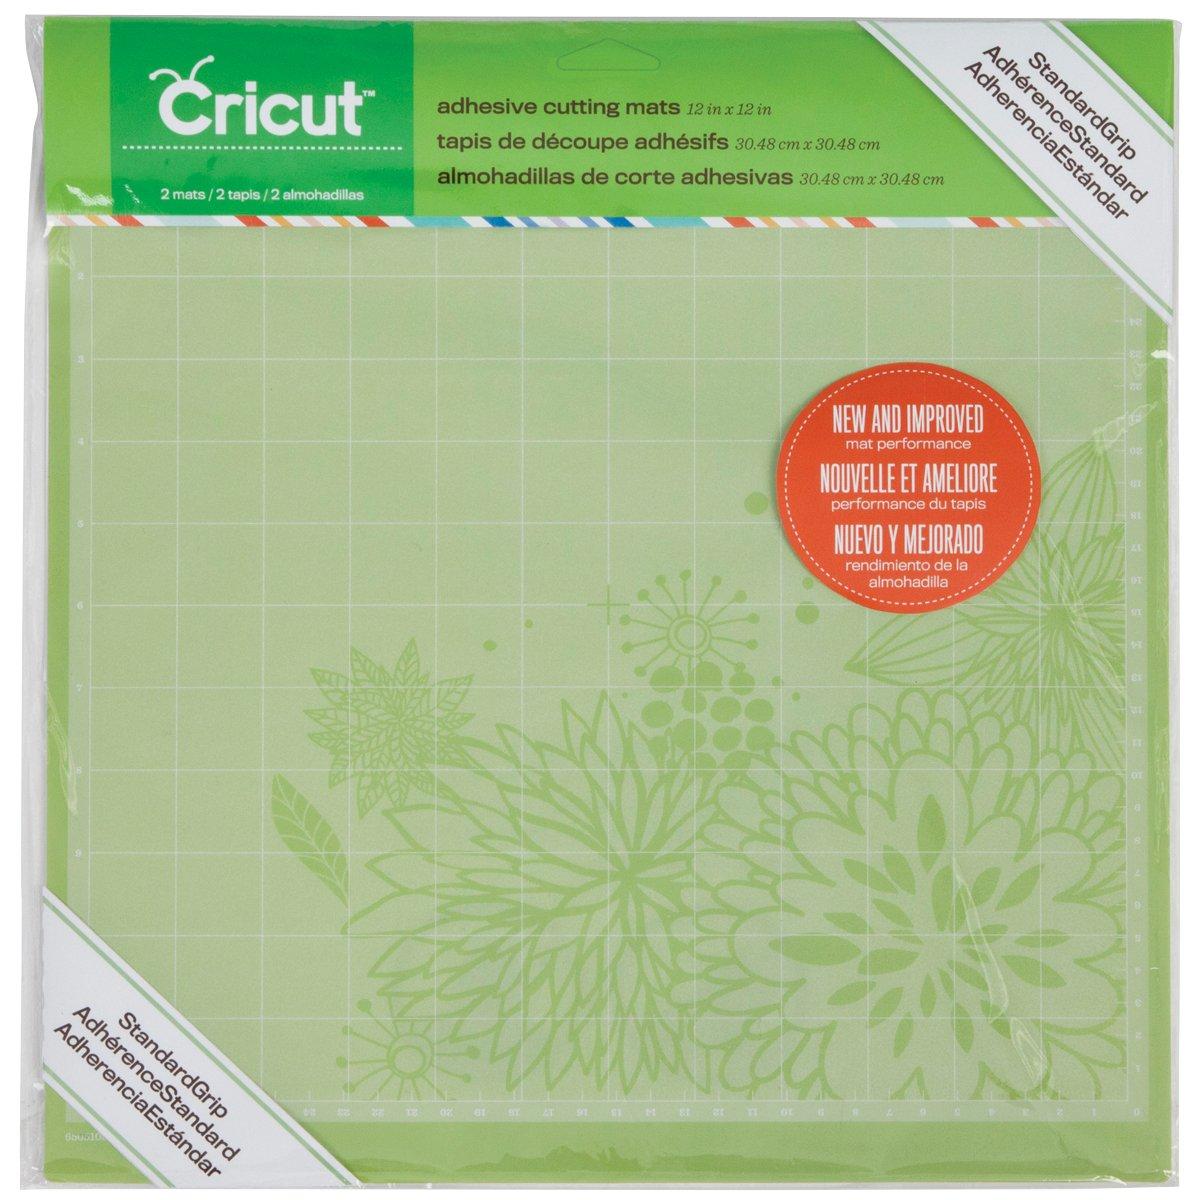 Cricut Adhesive Cutting Mat Standard Grip 12 x 12 2 pieces Per Package